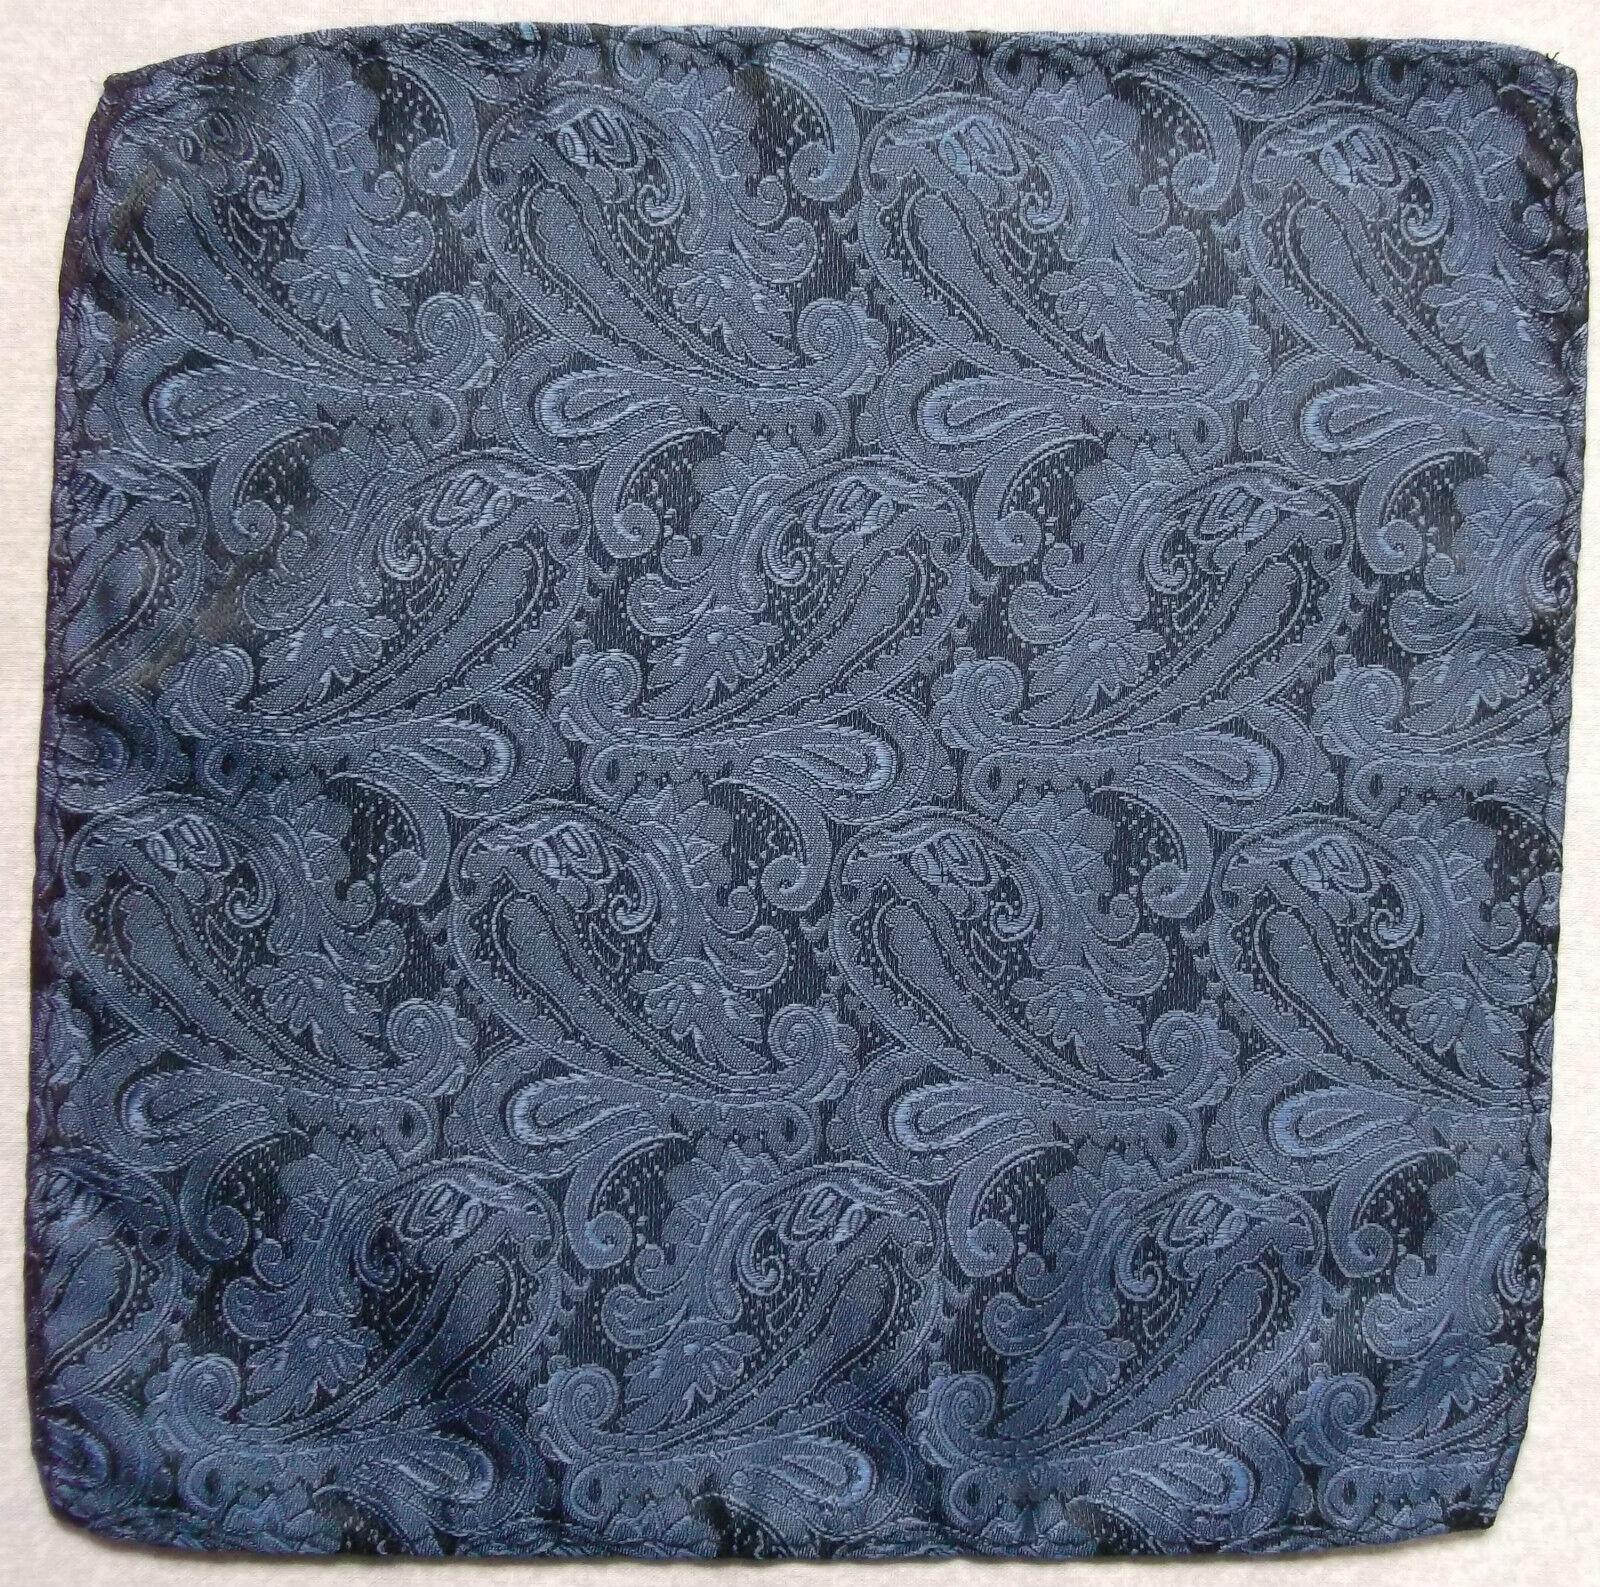 Handkerchief Pocket Square Handkerchief Mens Handkerchief Navy Blue Paisley